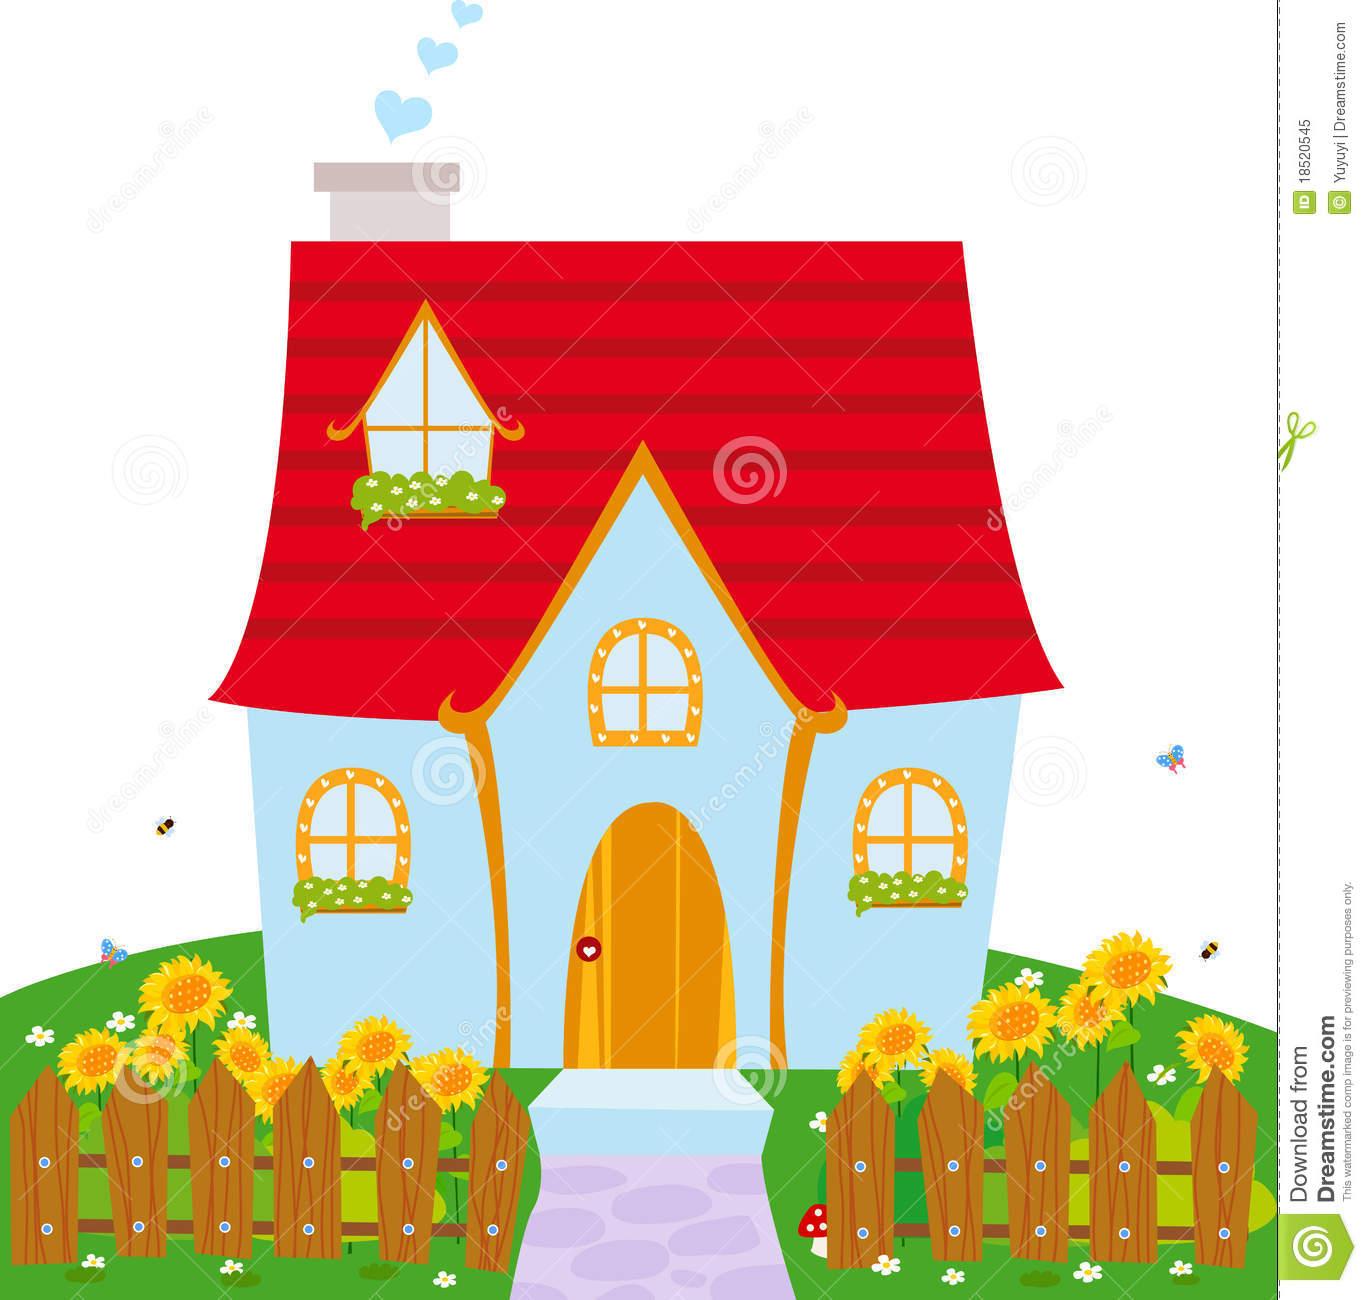 House Royalty Free Stock Photo Image 18520545